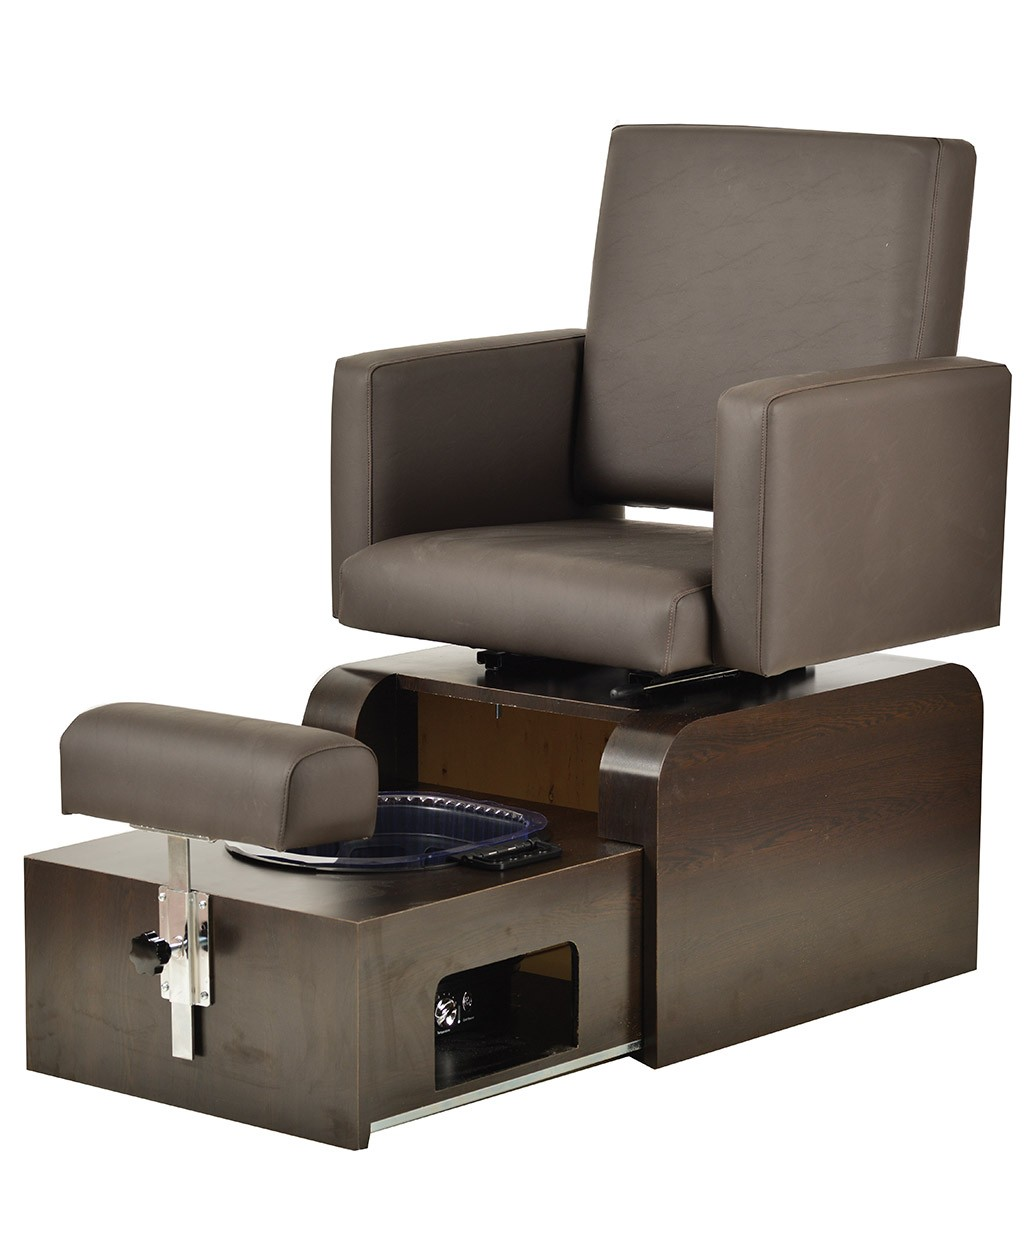 cheap pedicure chairs rocking chair springs uk spa portable pipeless no plumbing pibbs ps10 san remo footsie